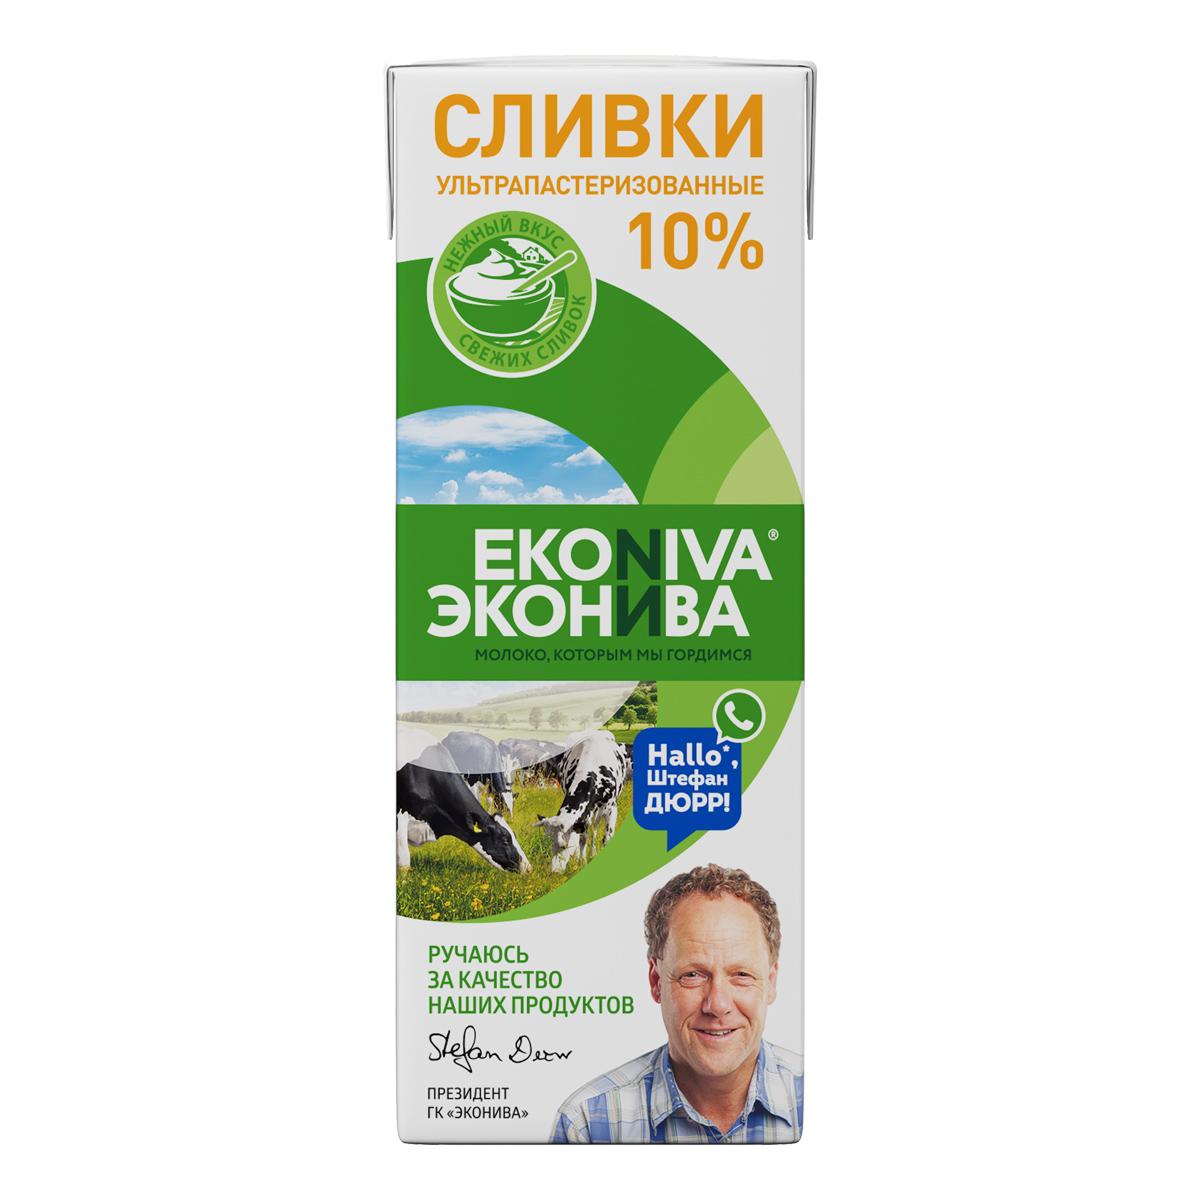 Organic EKONIVA UHT cream 0.2 liter carton, 10% fat in stock